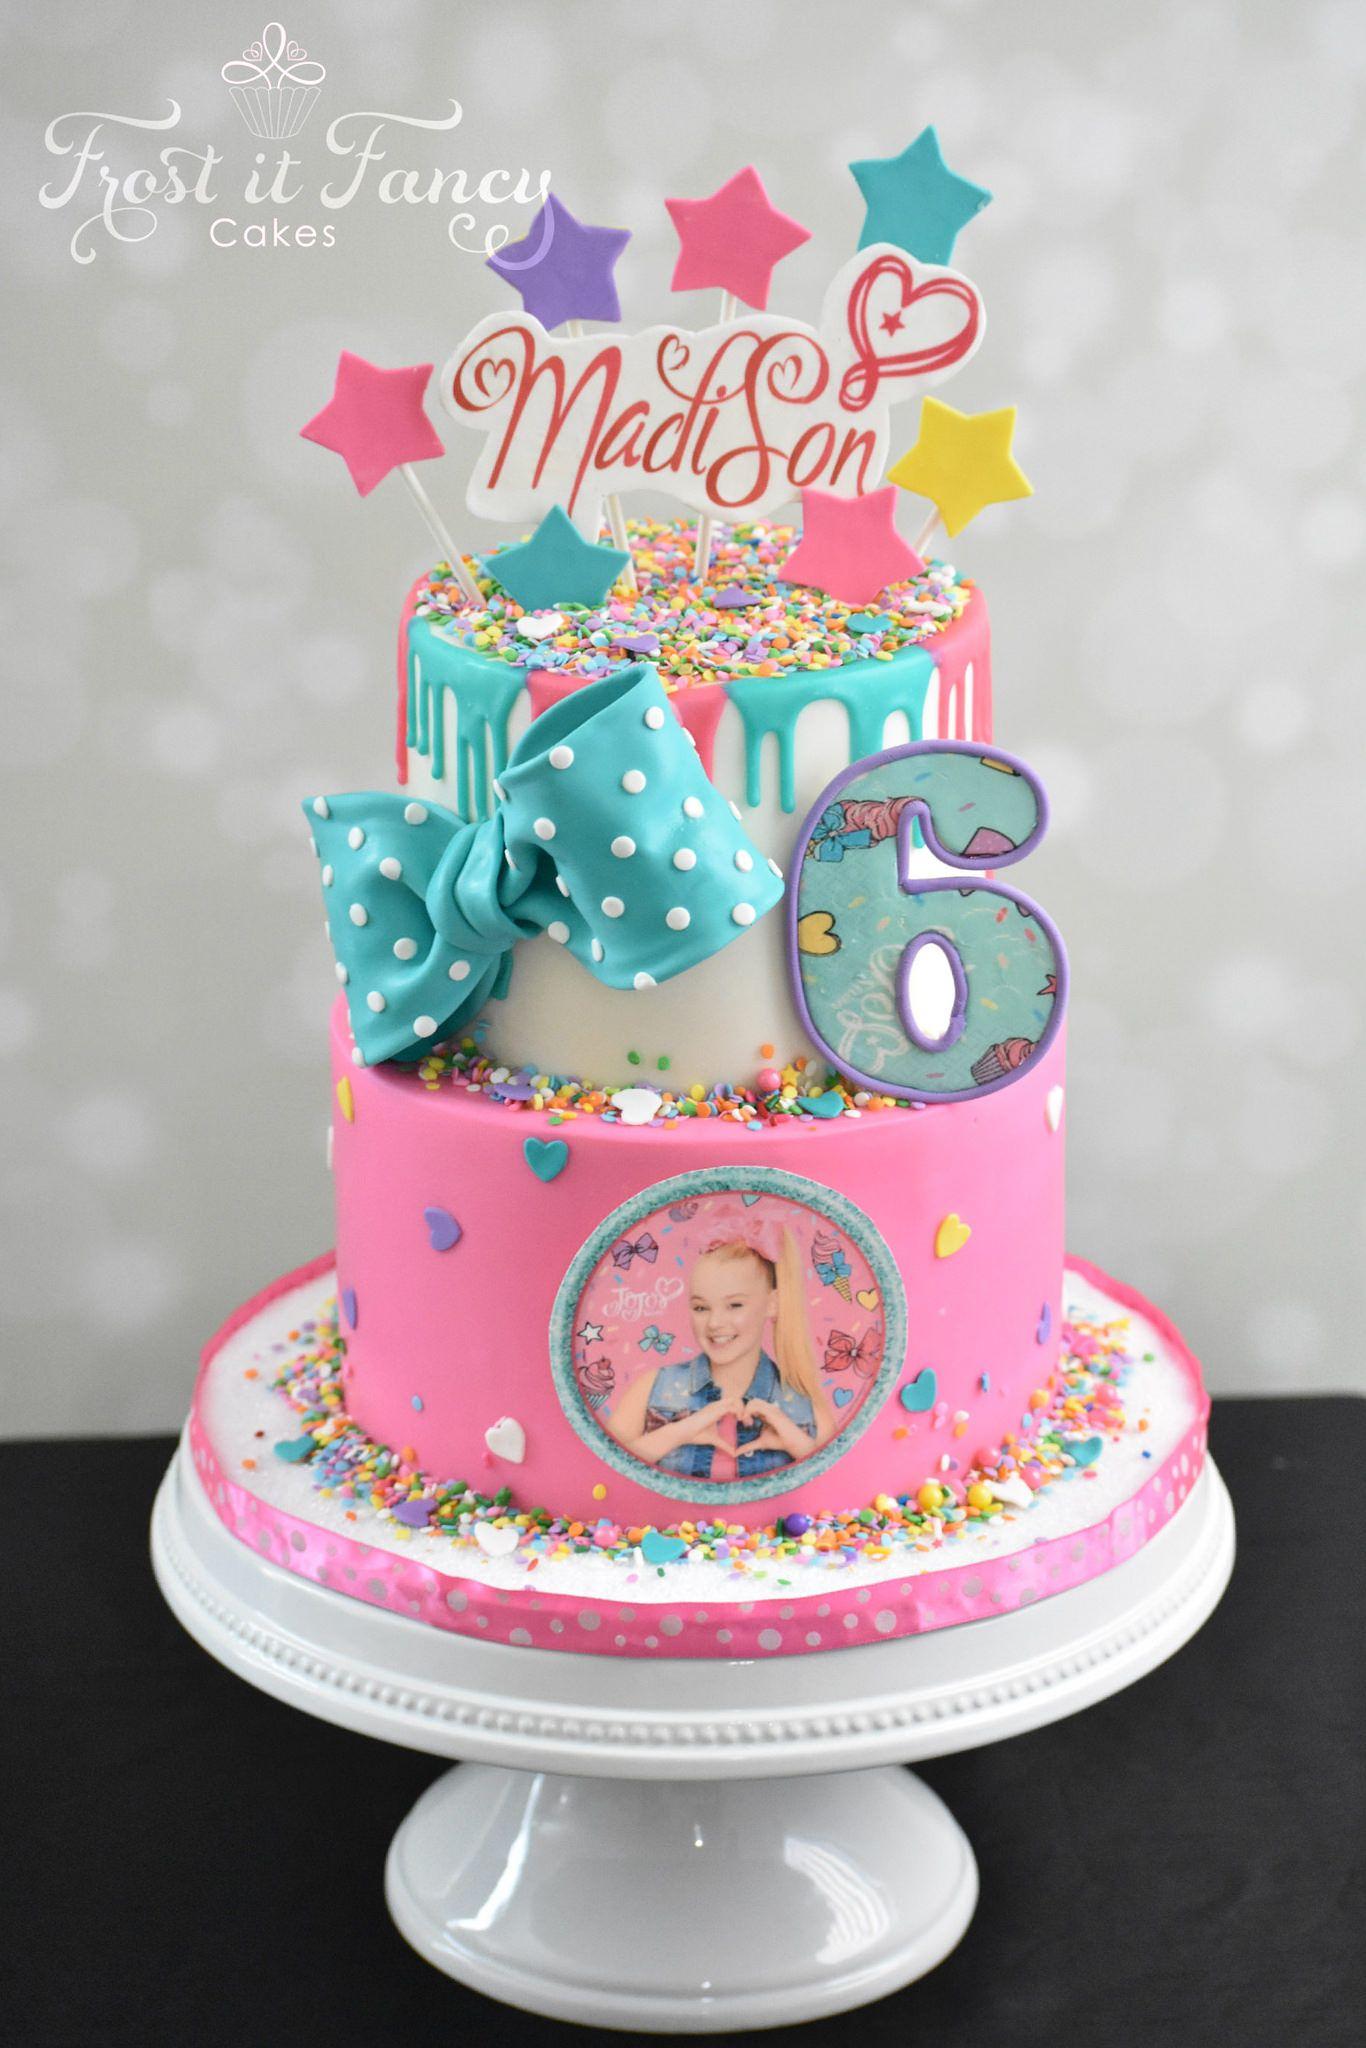 Happy birthday madison jojo siwa birthday cake jojo